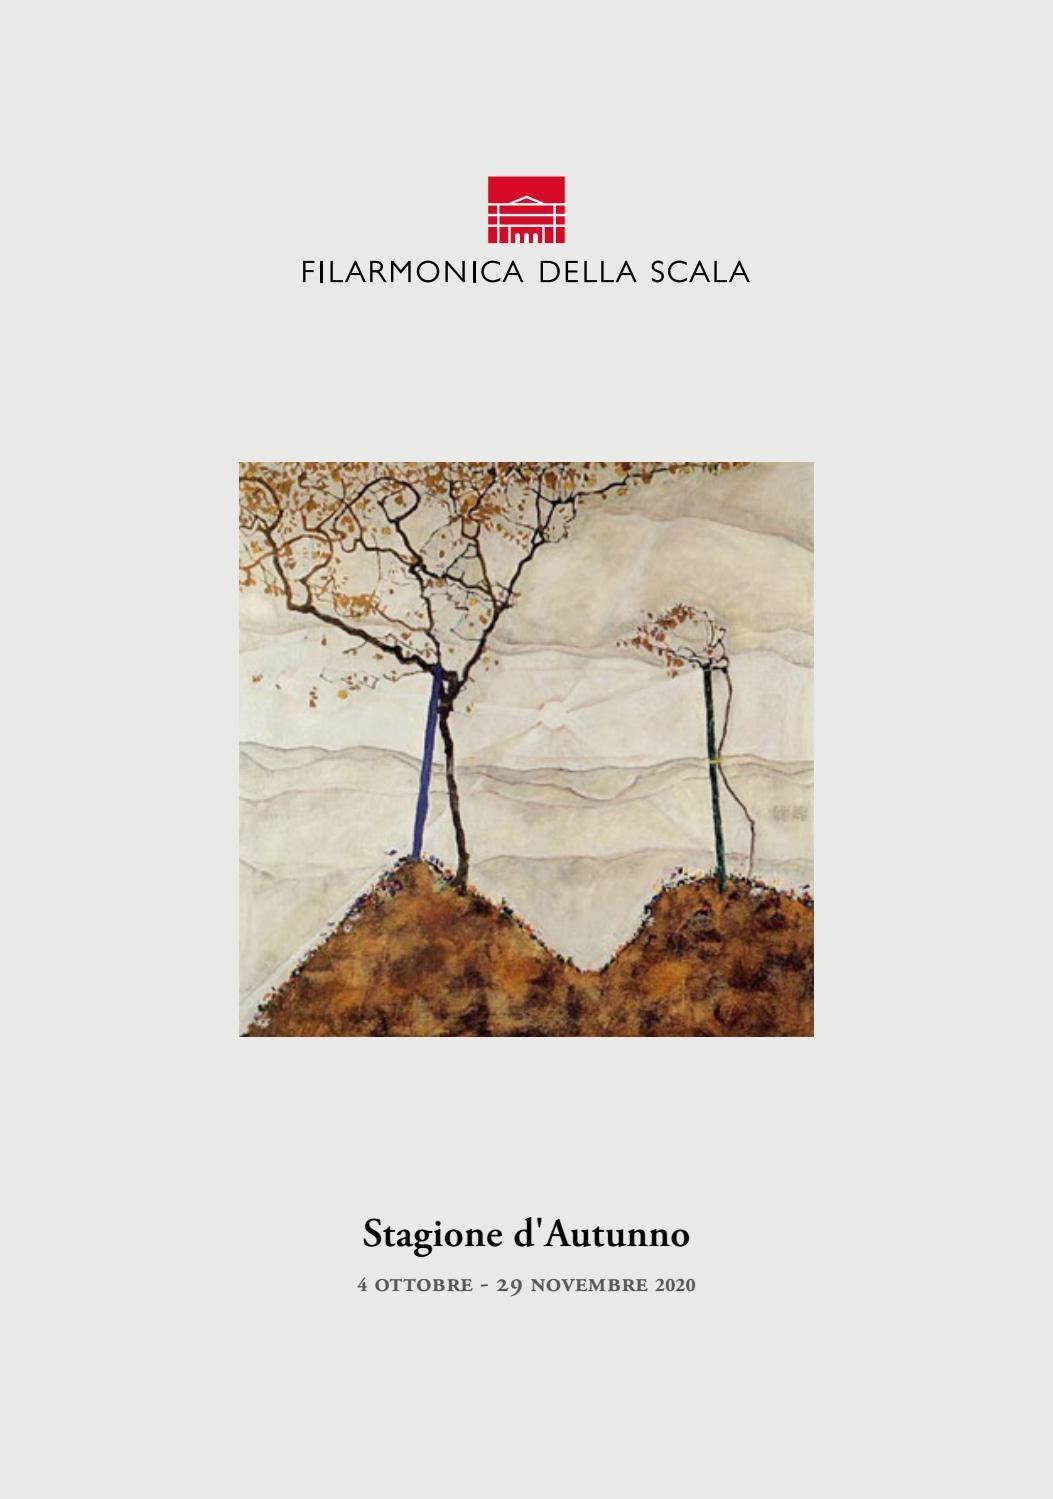 Path Of The Wanderer Autumn Concerts Season 2020 By Filarmonica Della Scala Issuu